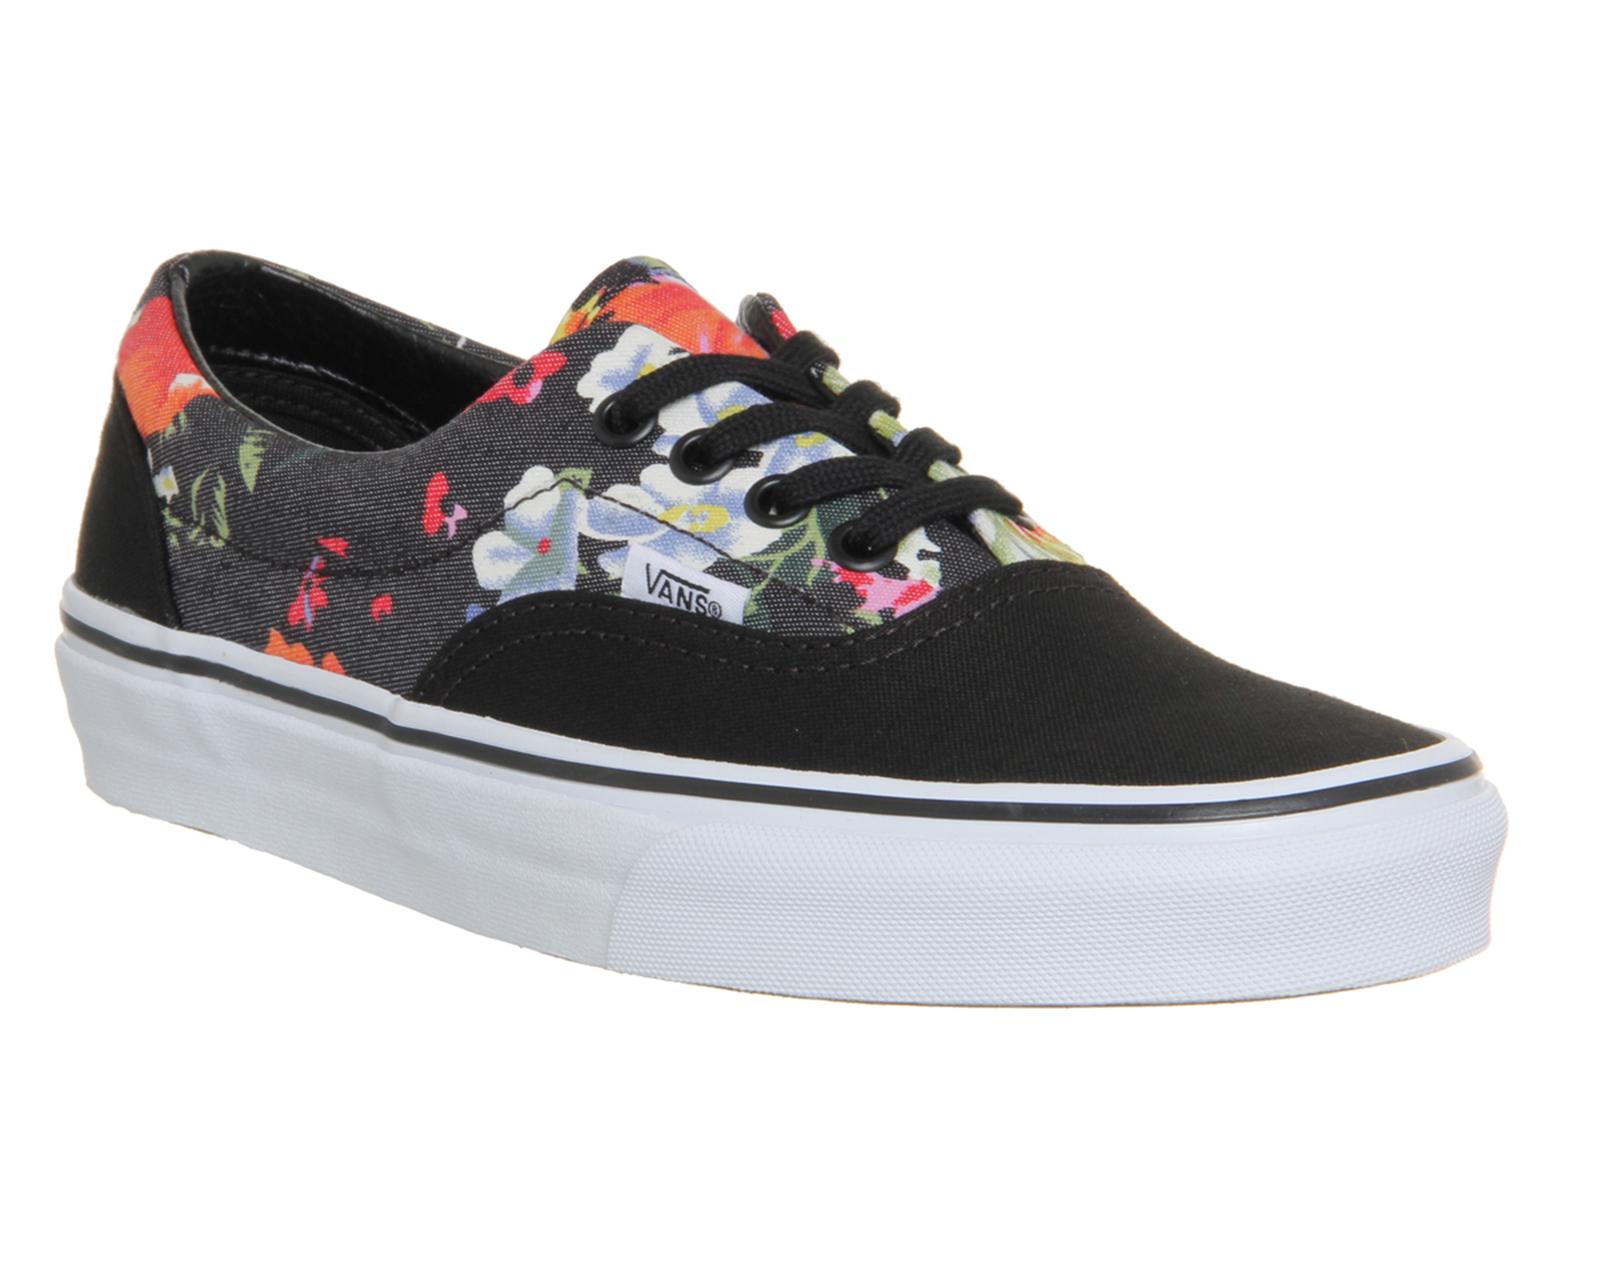 vans floral chaussures philippines